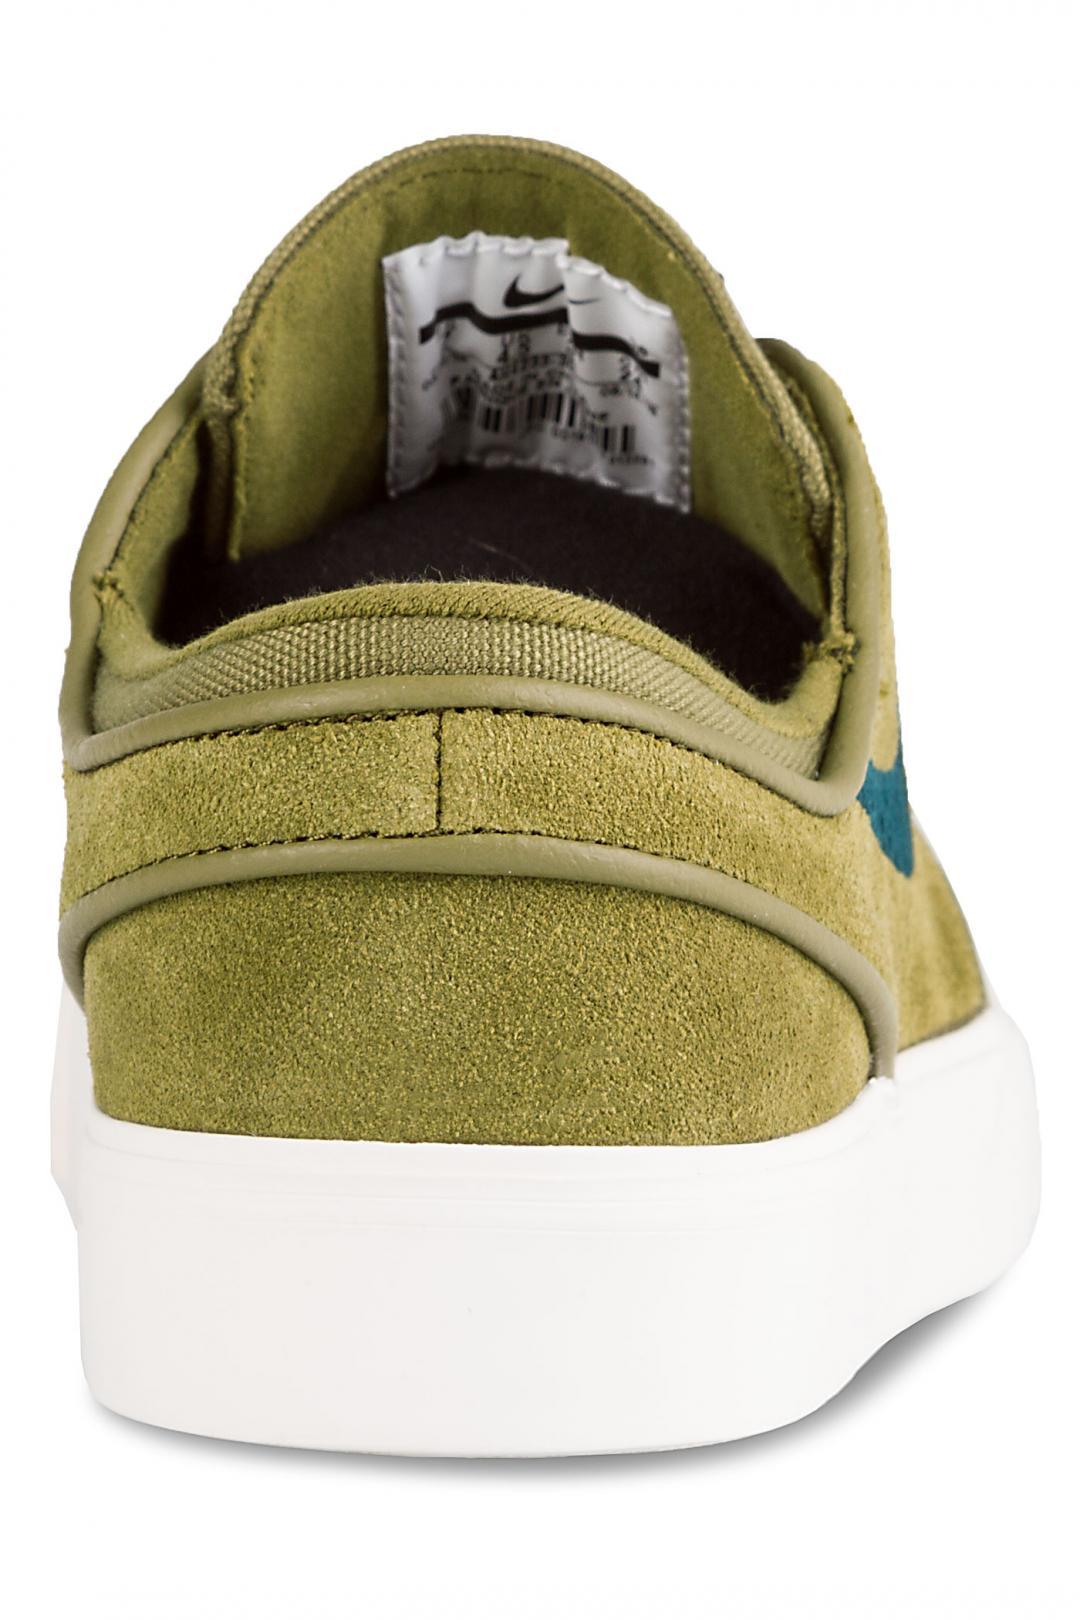 Donna Nike SB Zoom Stefan Janoski olive flak midnight spruce | Scarpe da skate